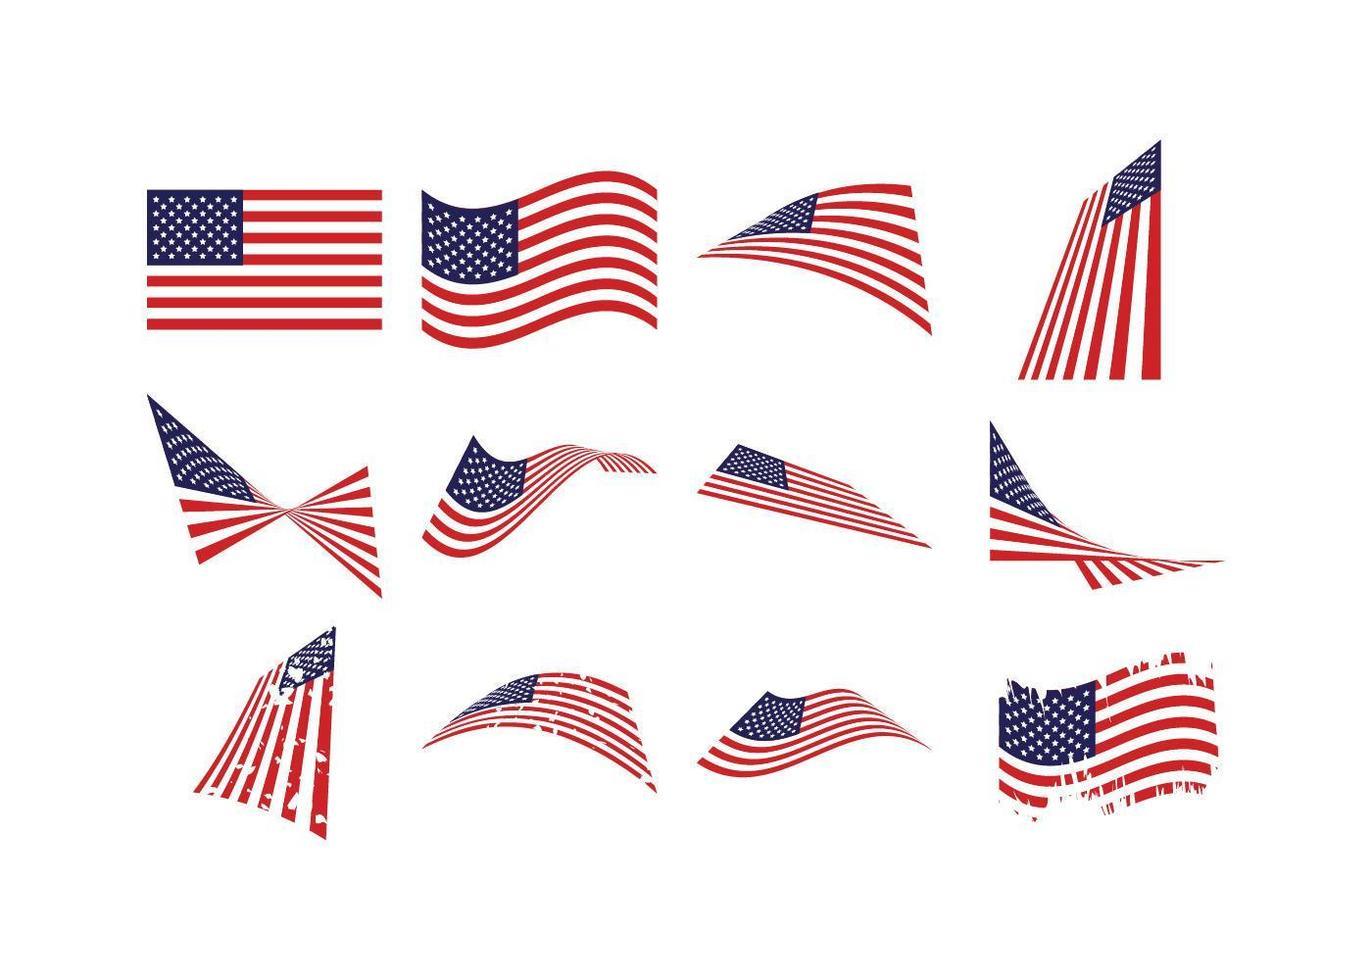 usa vlag is ingesteld vector